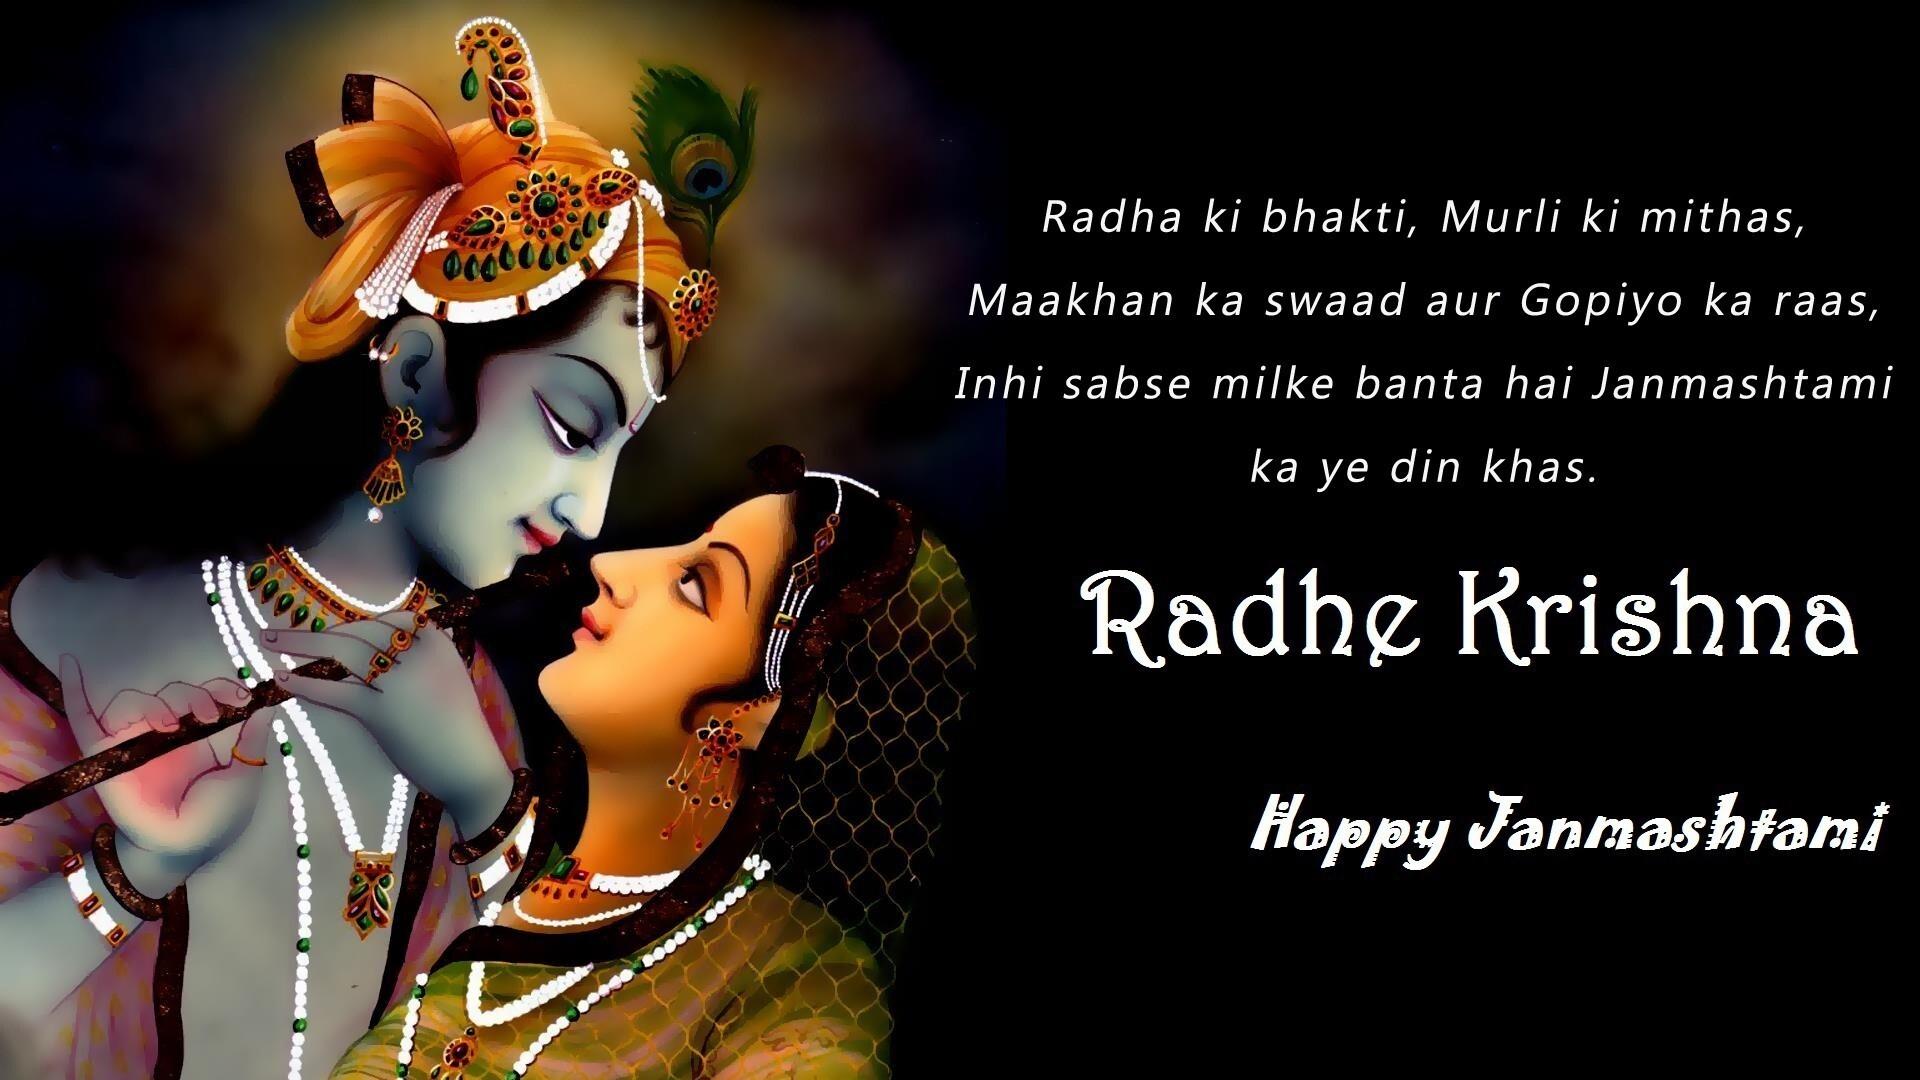 God Radhe Krishna Wish You Happy Janmashtami | HD Wallpapers